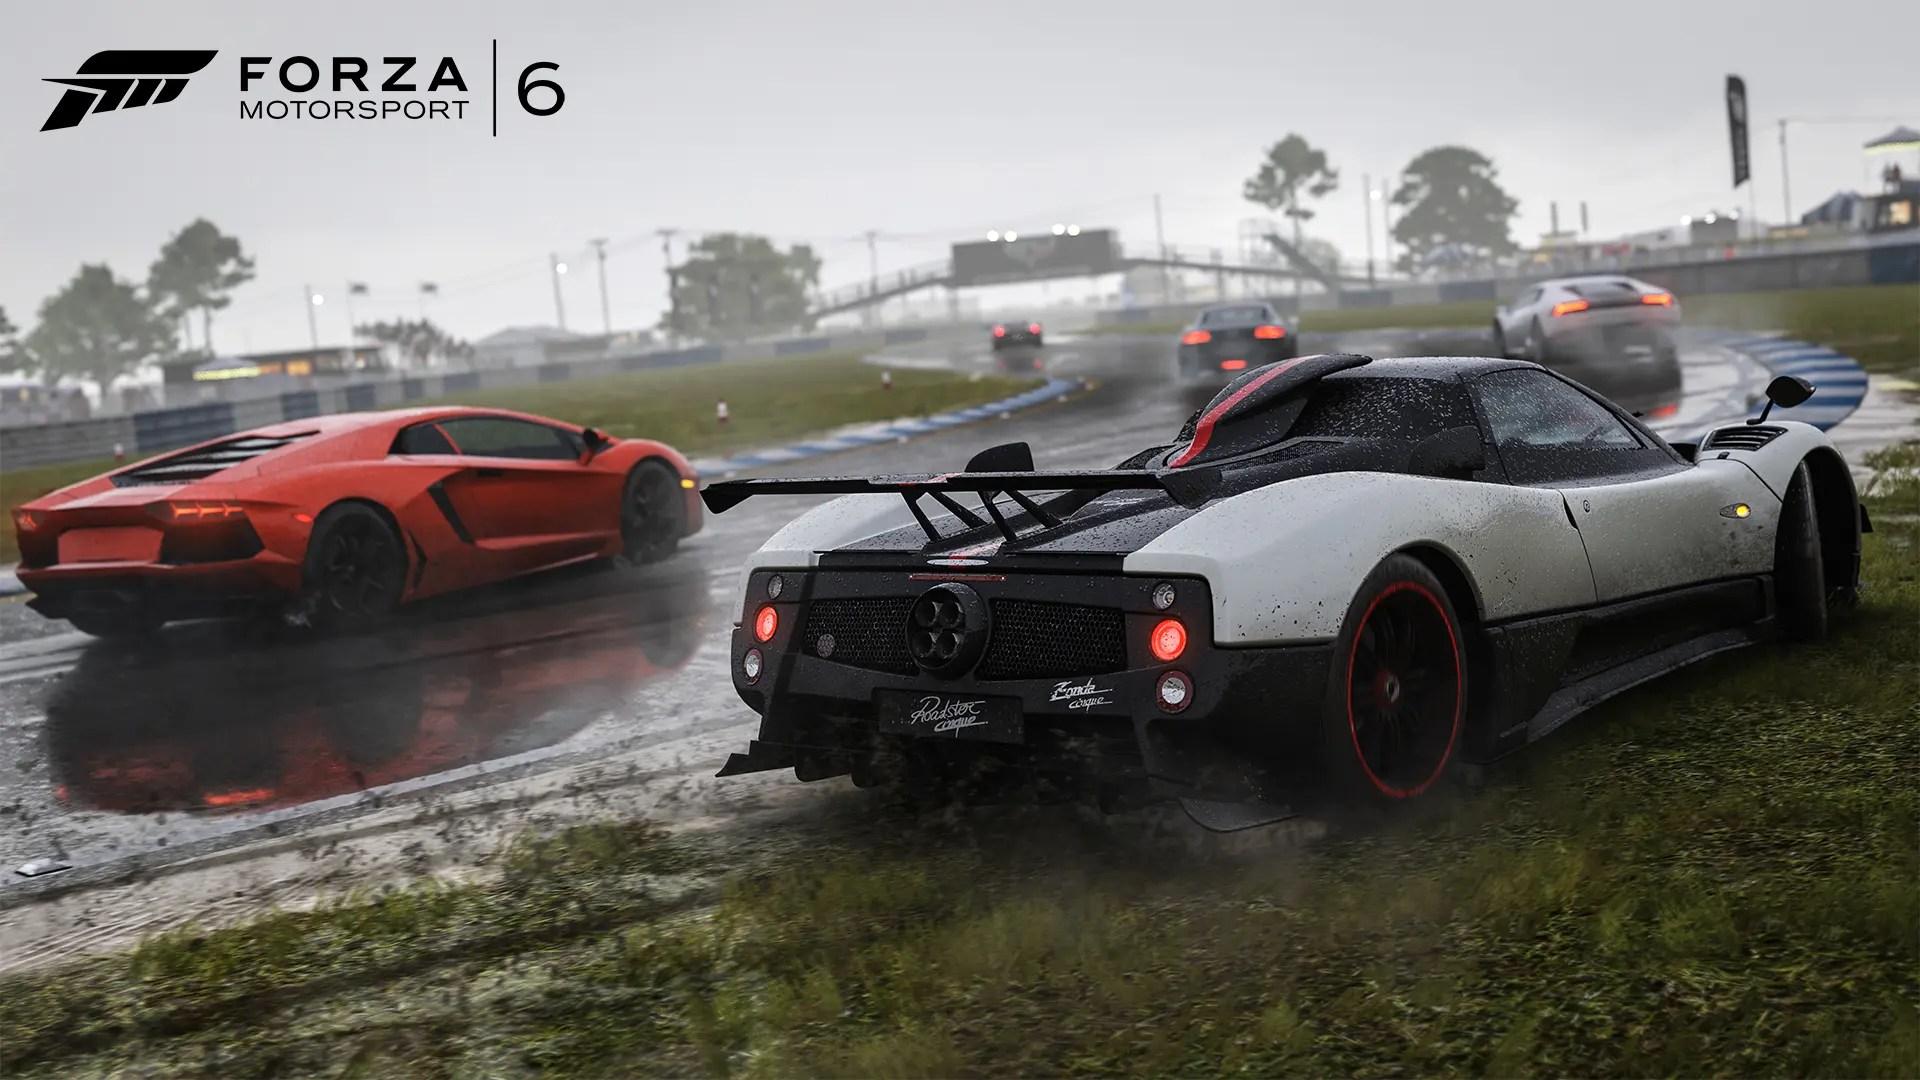 ForzaMotorsport6-8